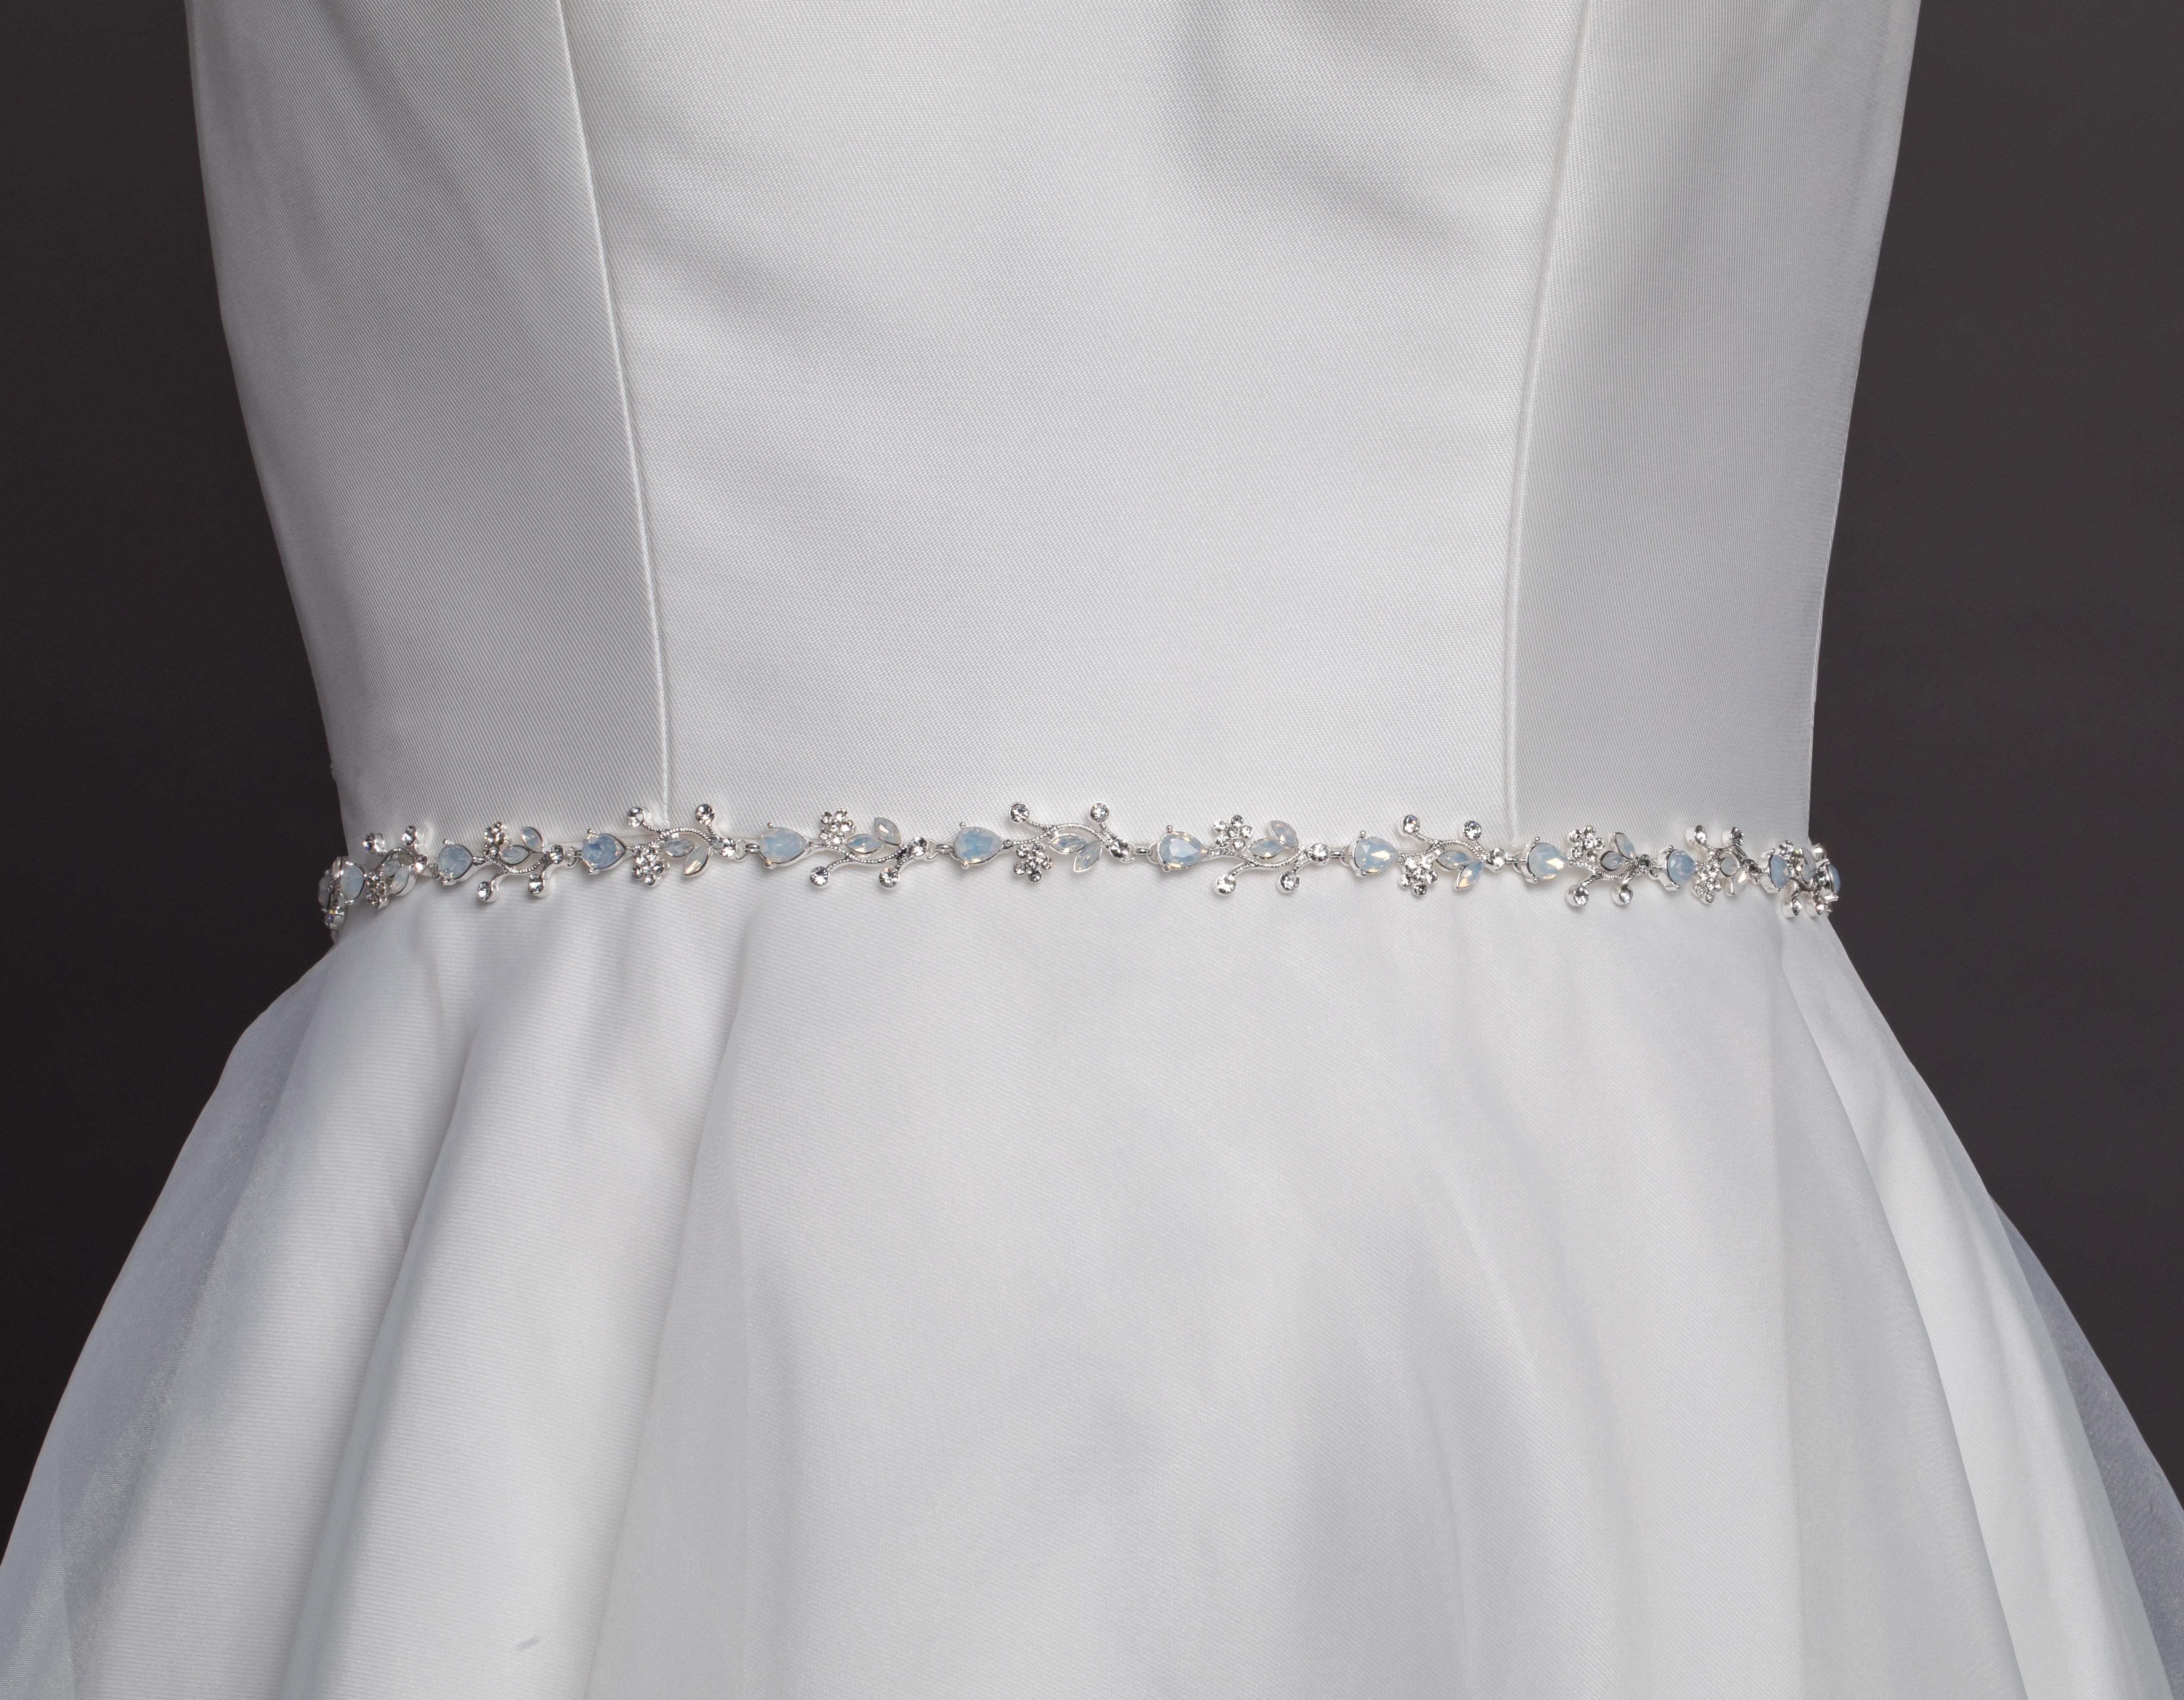 Bridal Classics Belts & Gown Jewellery HB-7114B